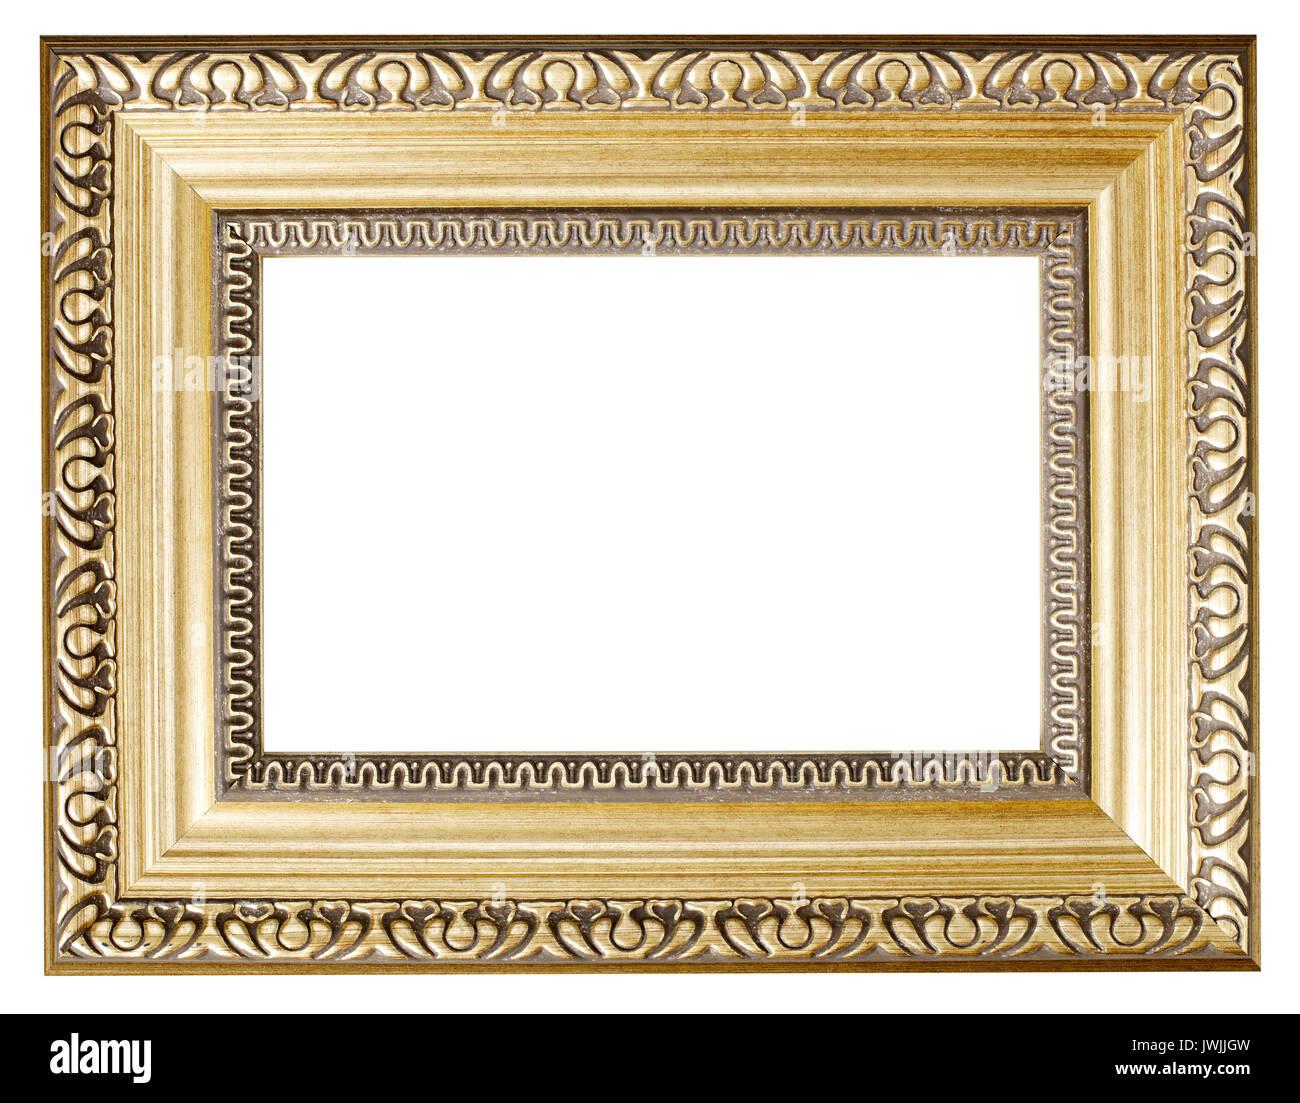 gold bemalt bilderrahmen stockfoto, bild: 153459065 - alamy